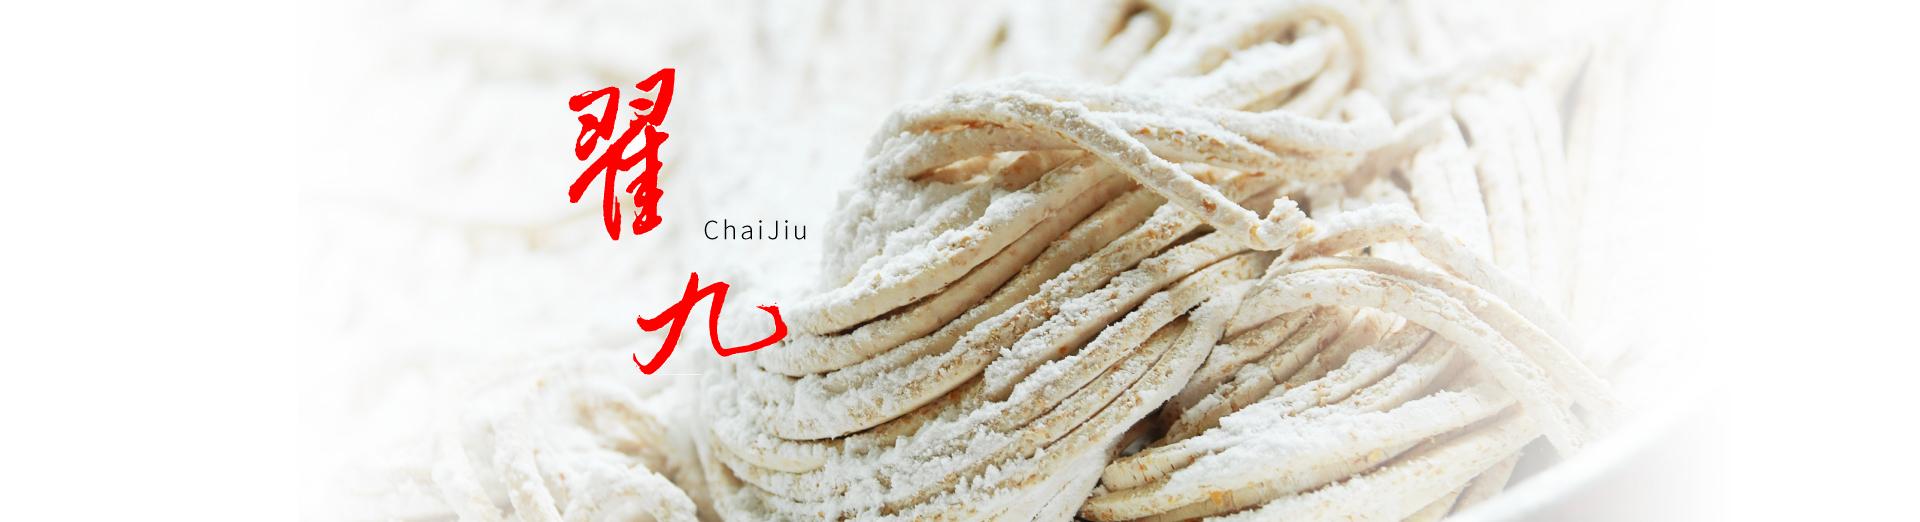 http://chai9.com/wp-content/uploads/banner_new.jpg